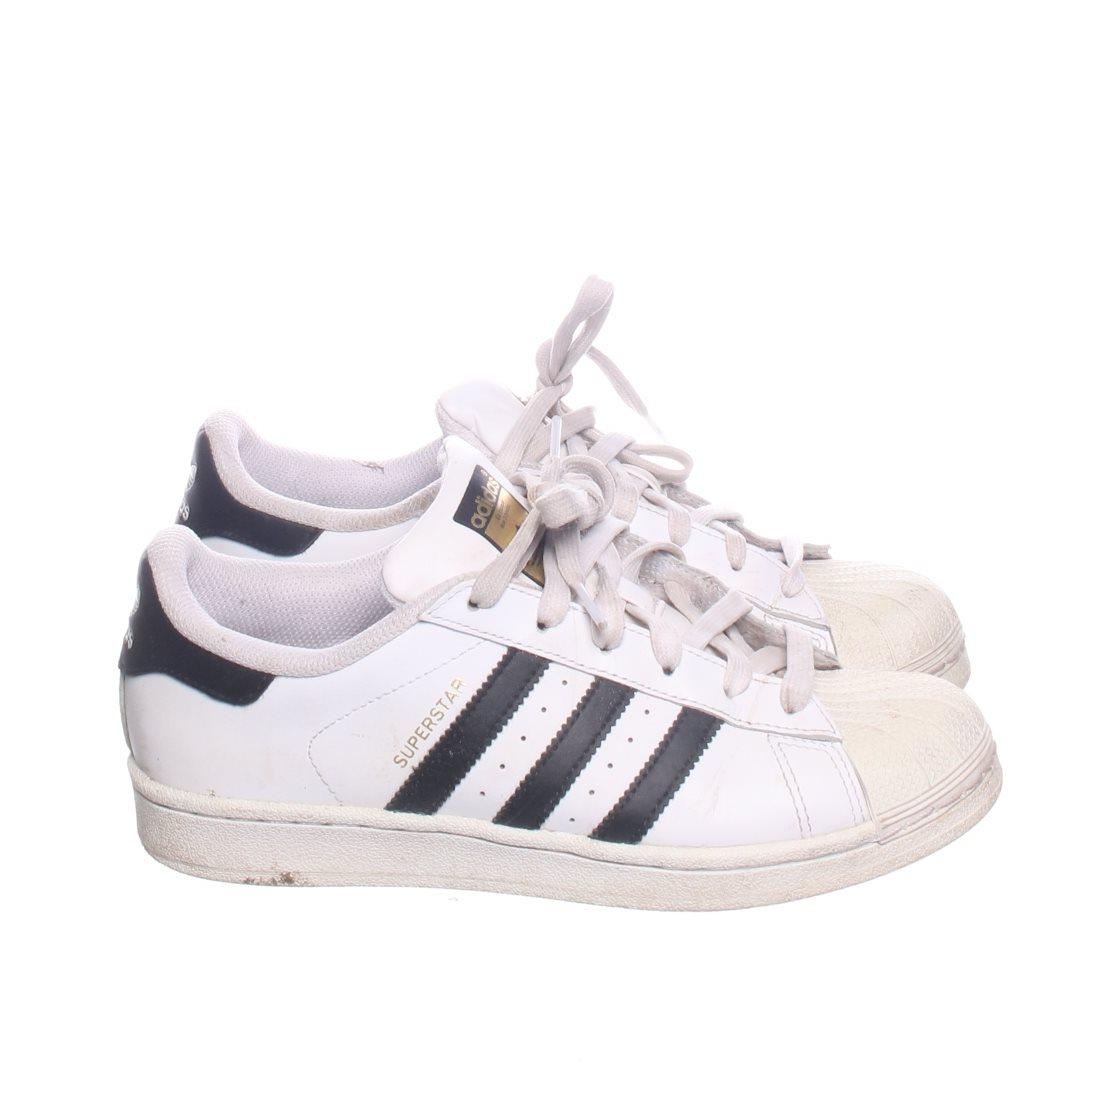 Adidas Originals ZX 700 Navy Mens Running Shoes AQ5422